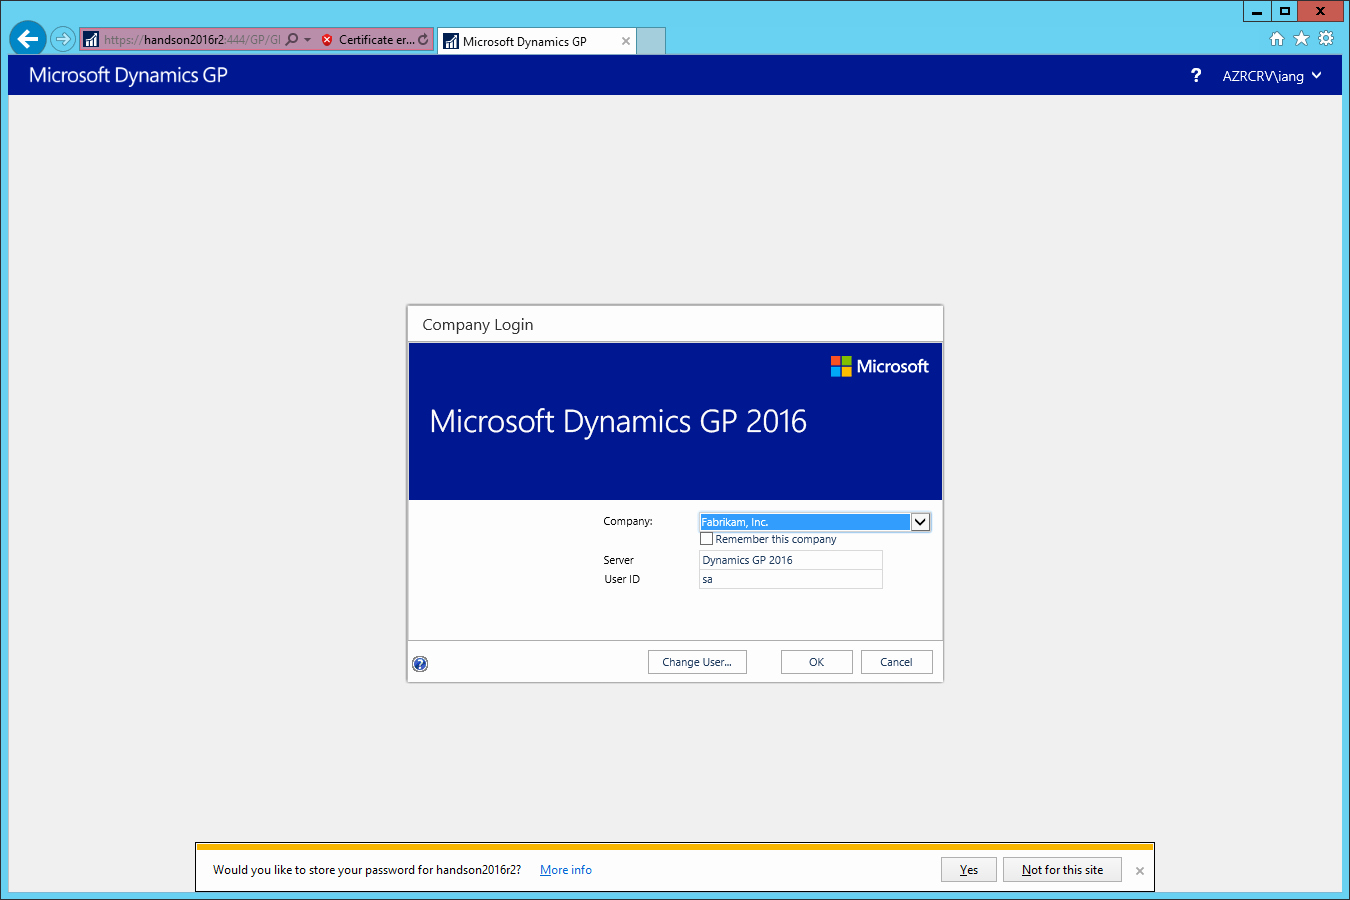 Www.login.microsoftonline.com Http //www.login.microsoftonline.com Luxury Hands with Microsoft Dynamics Gp 2016 R2 Test Web